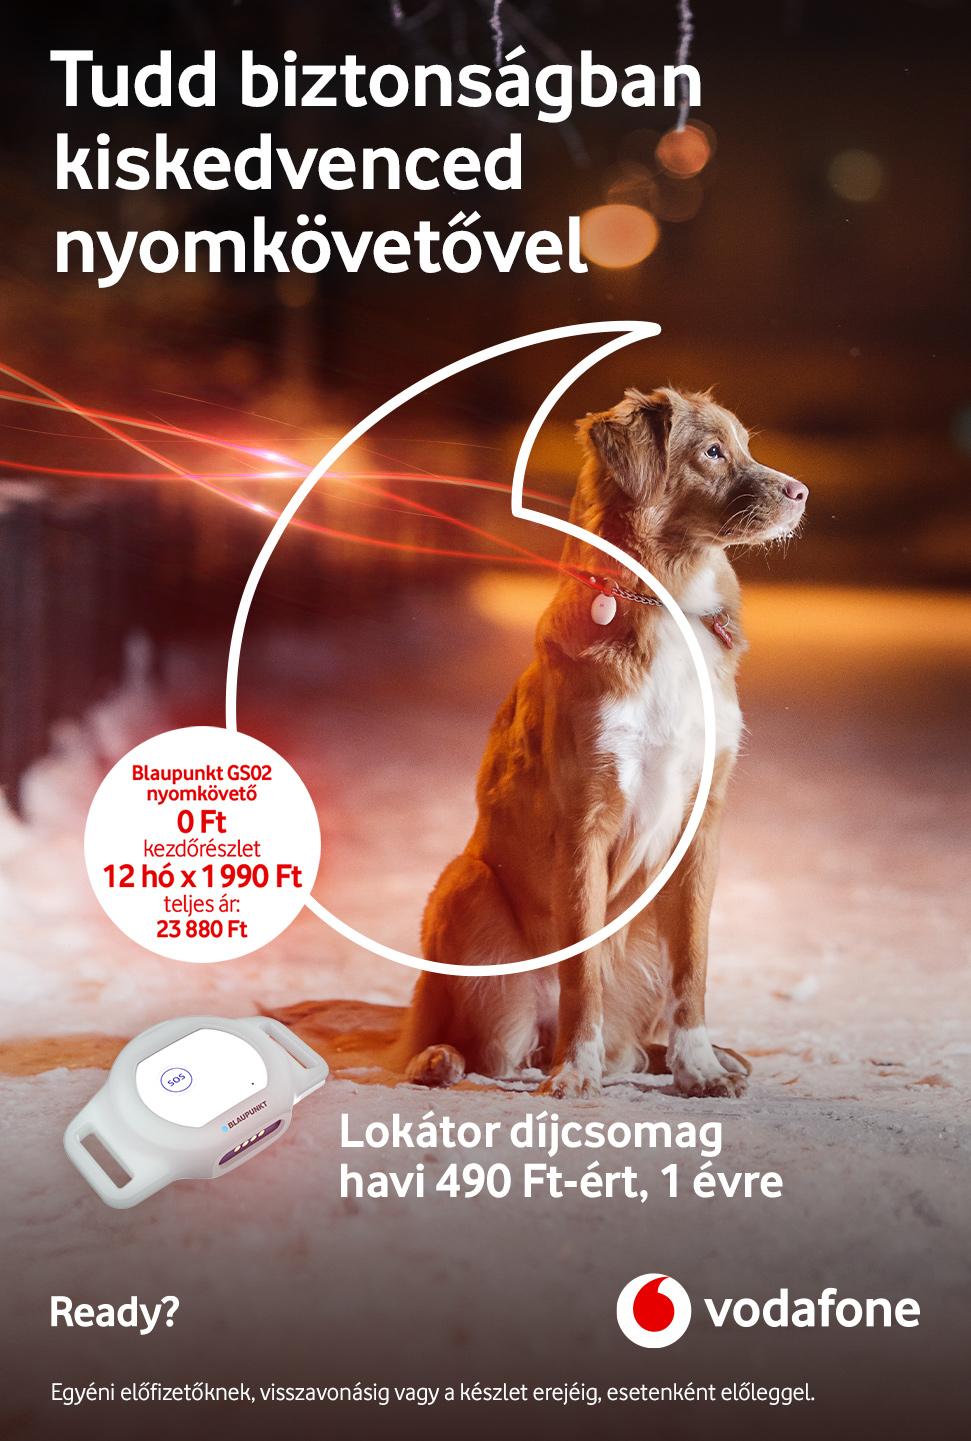 Vodafone Flotta